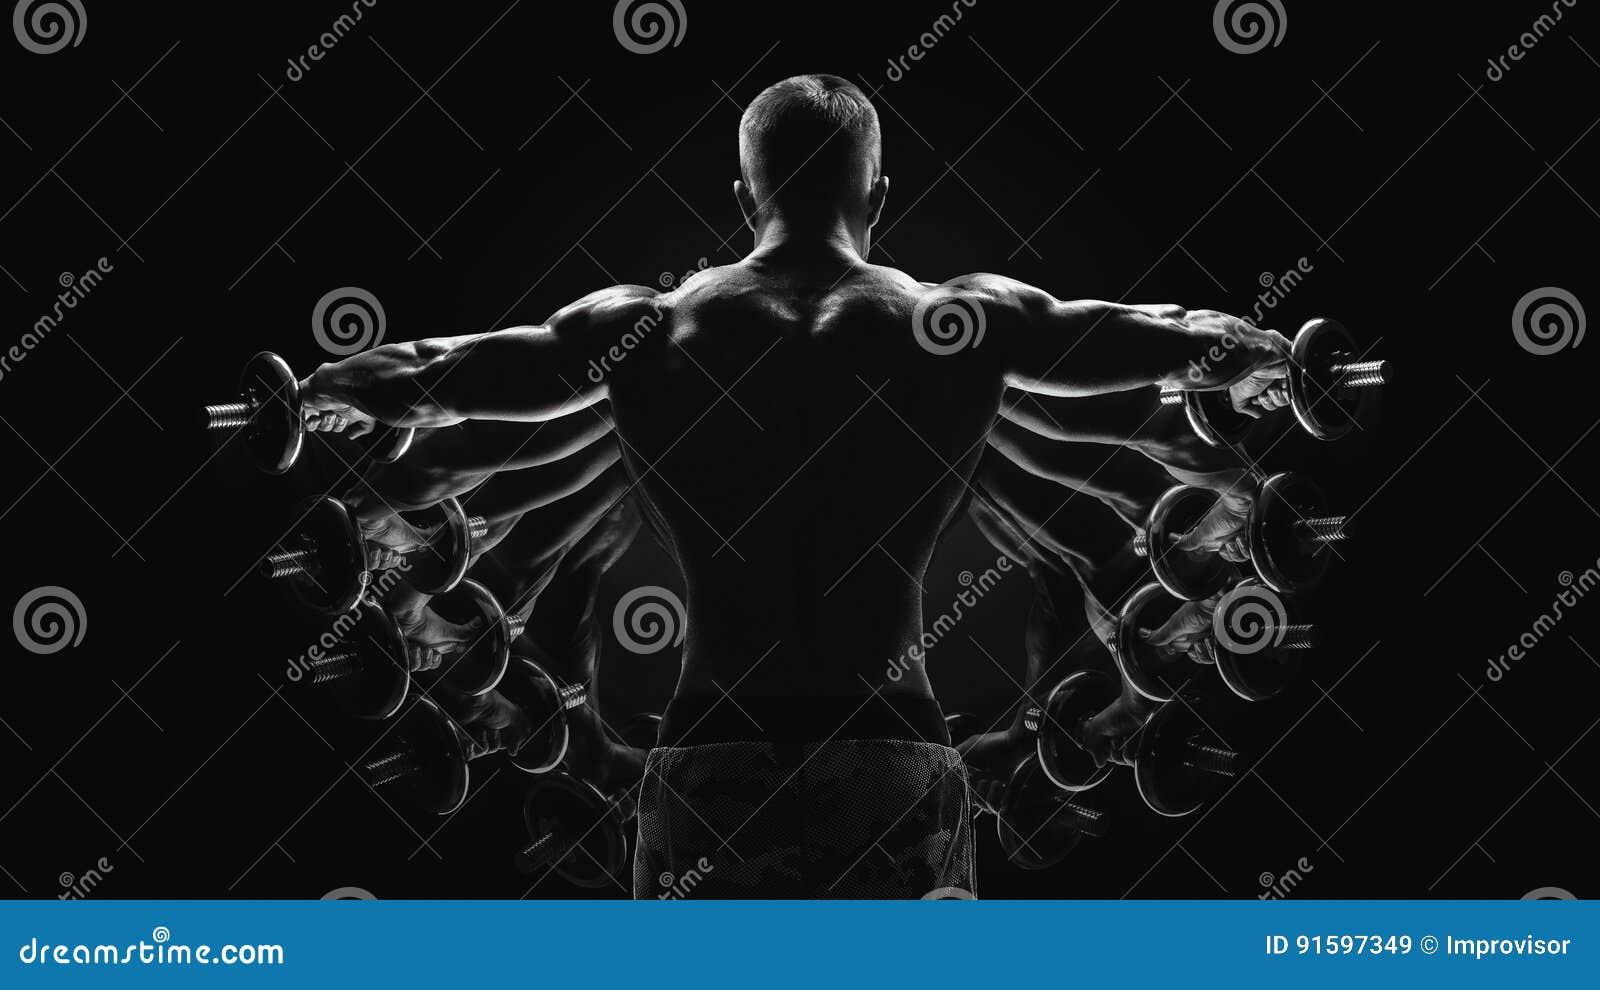 Black And White Concept Bodybuilder Turning Back Raising